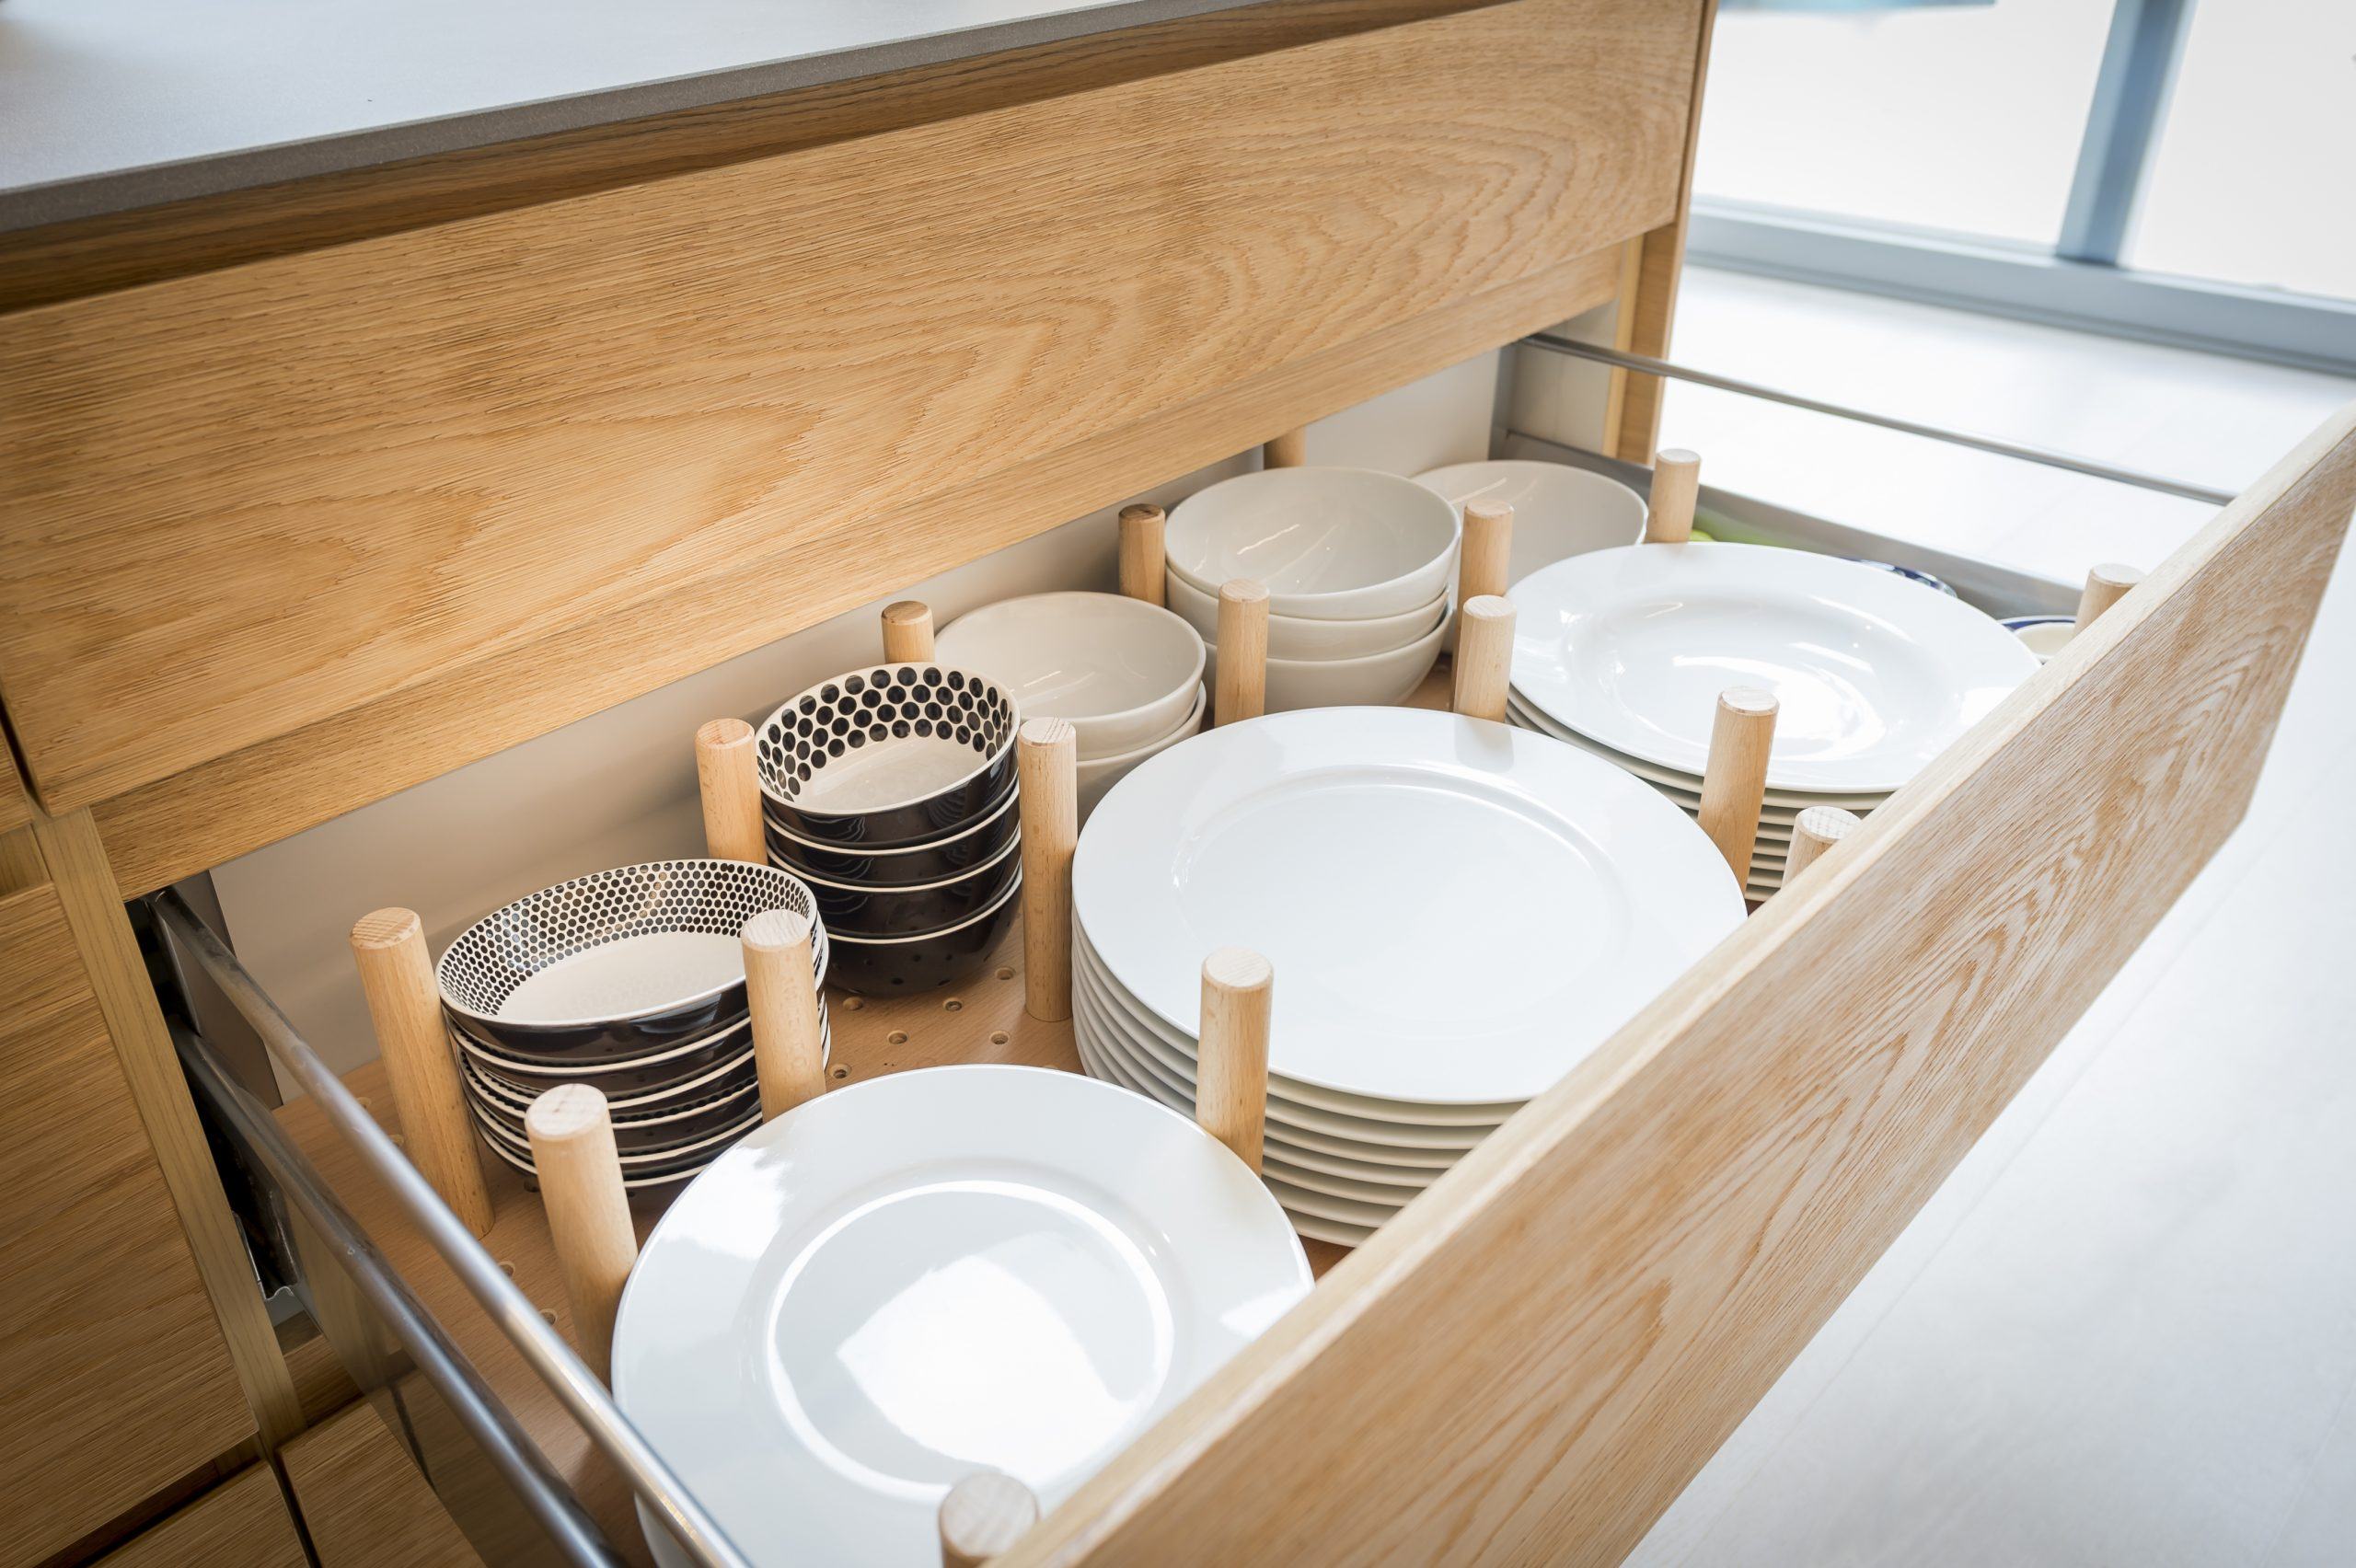 Kitchen cupboard with opened drawer organizer